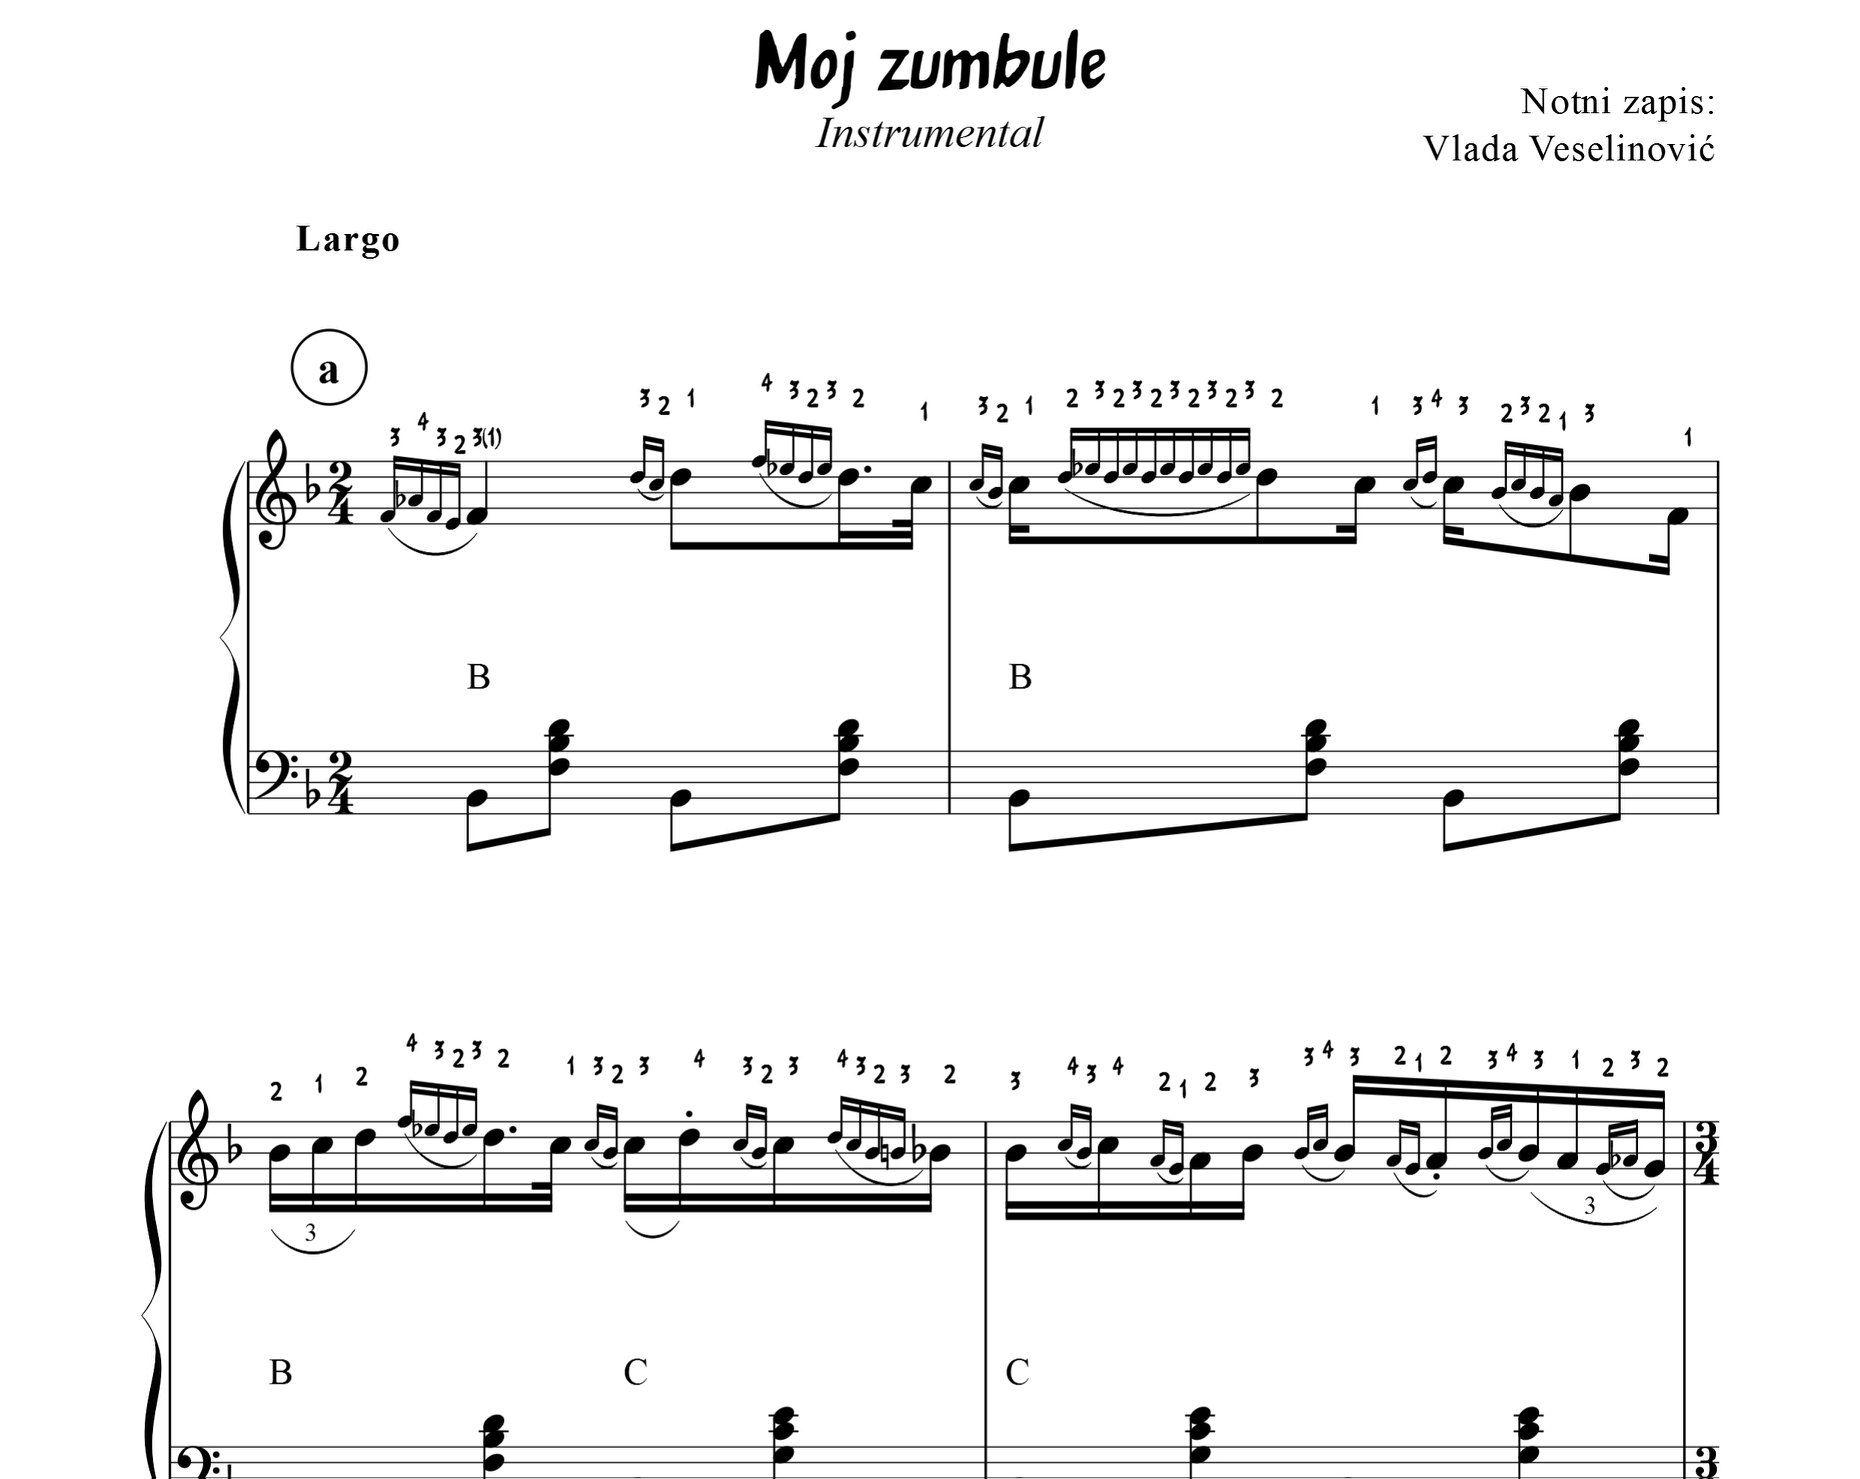 Knjiga Pesma I Harmonika 2 Notes Sheet Music In This Moment